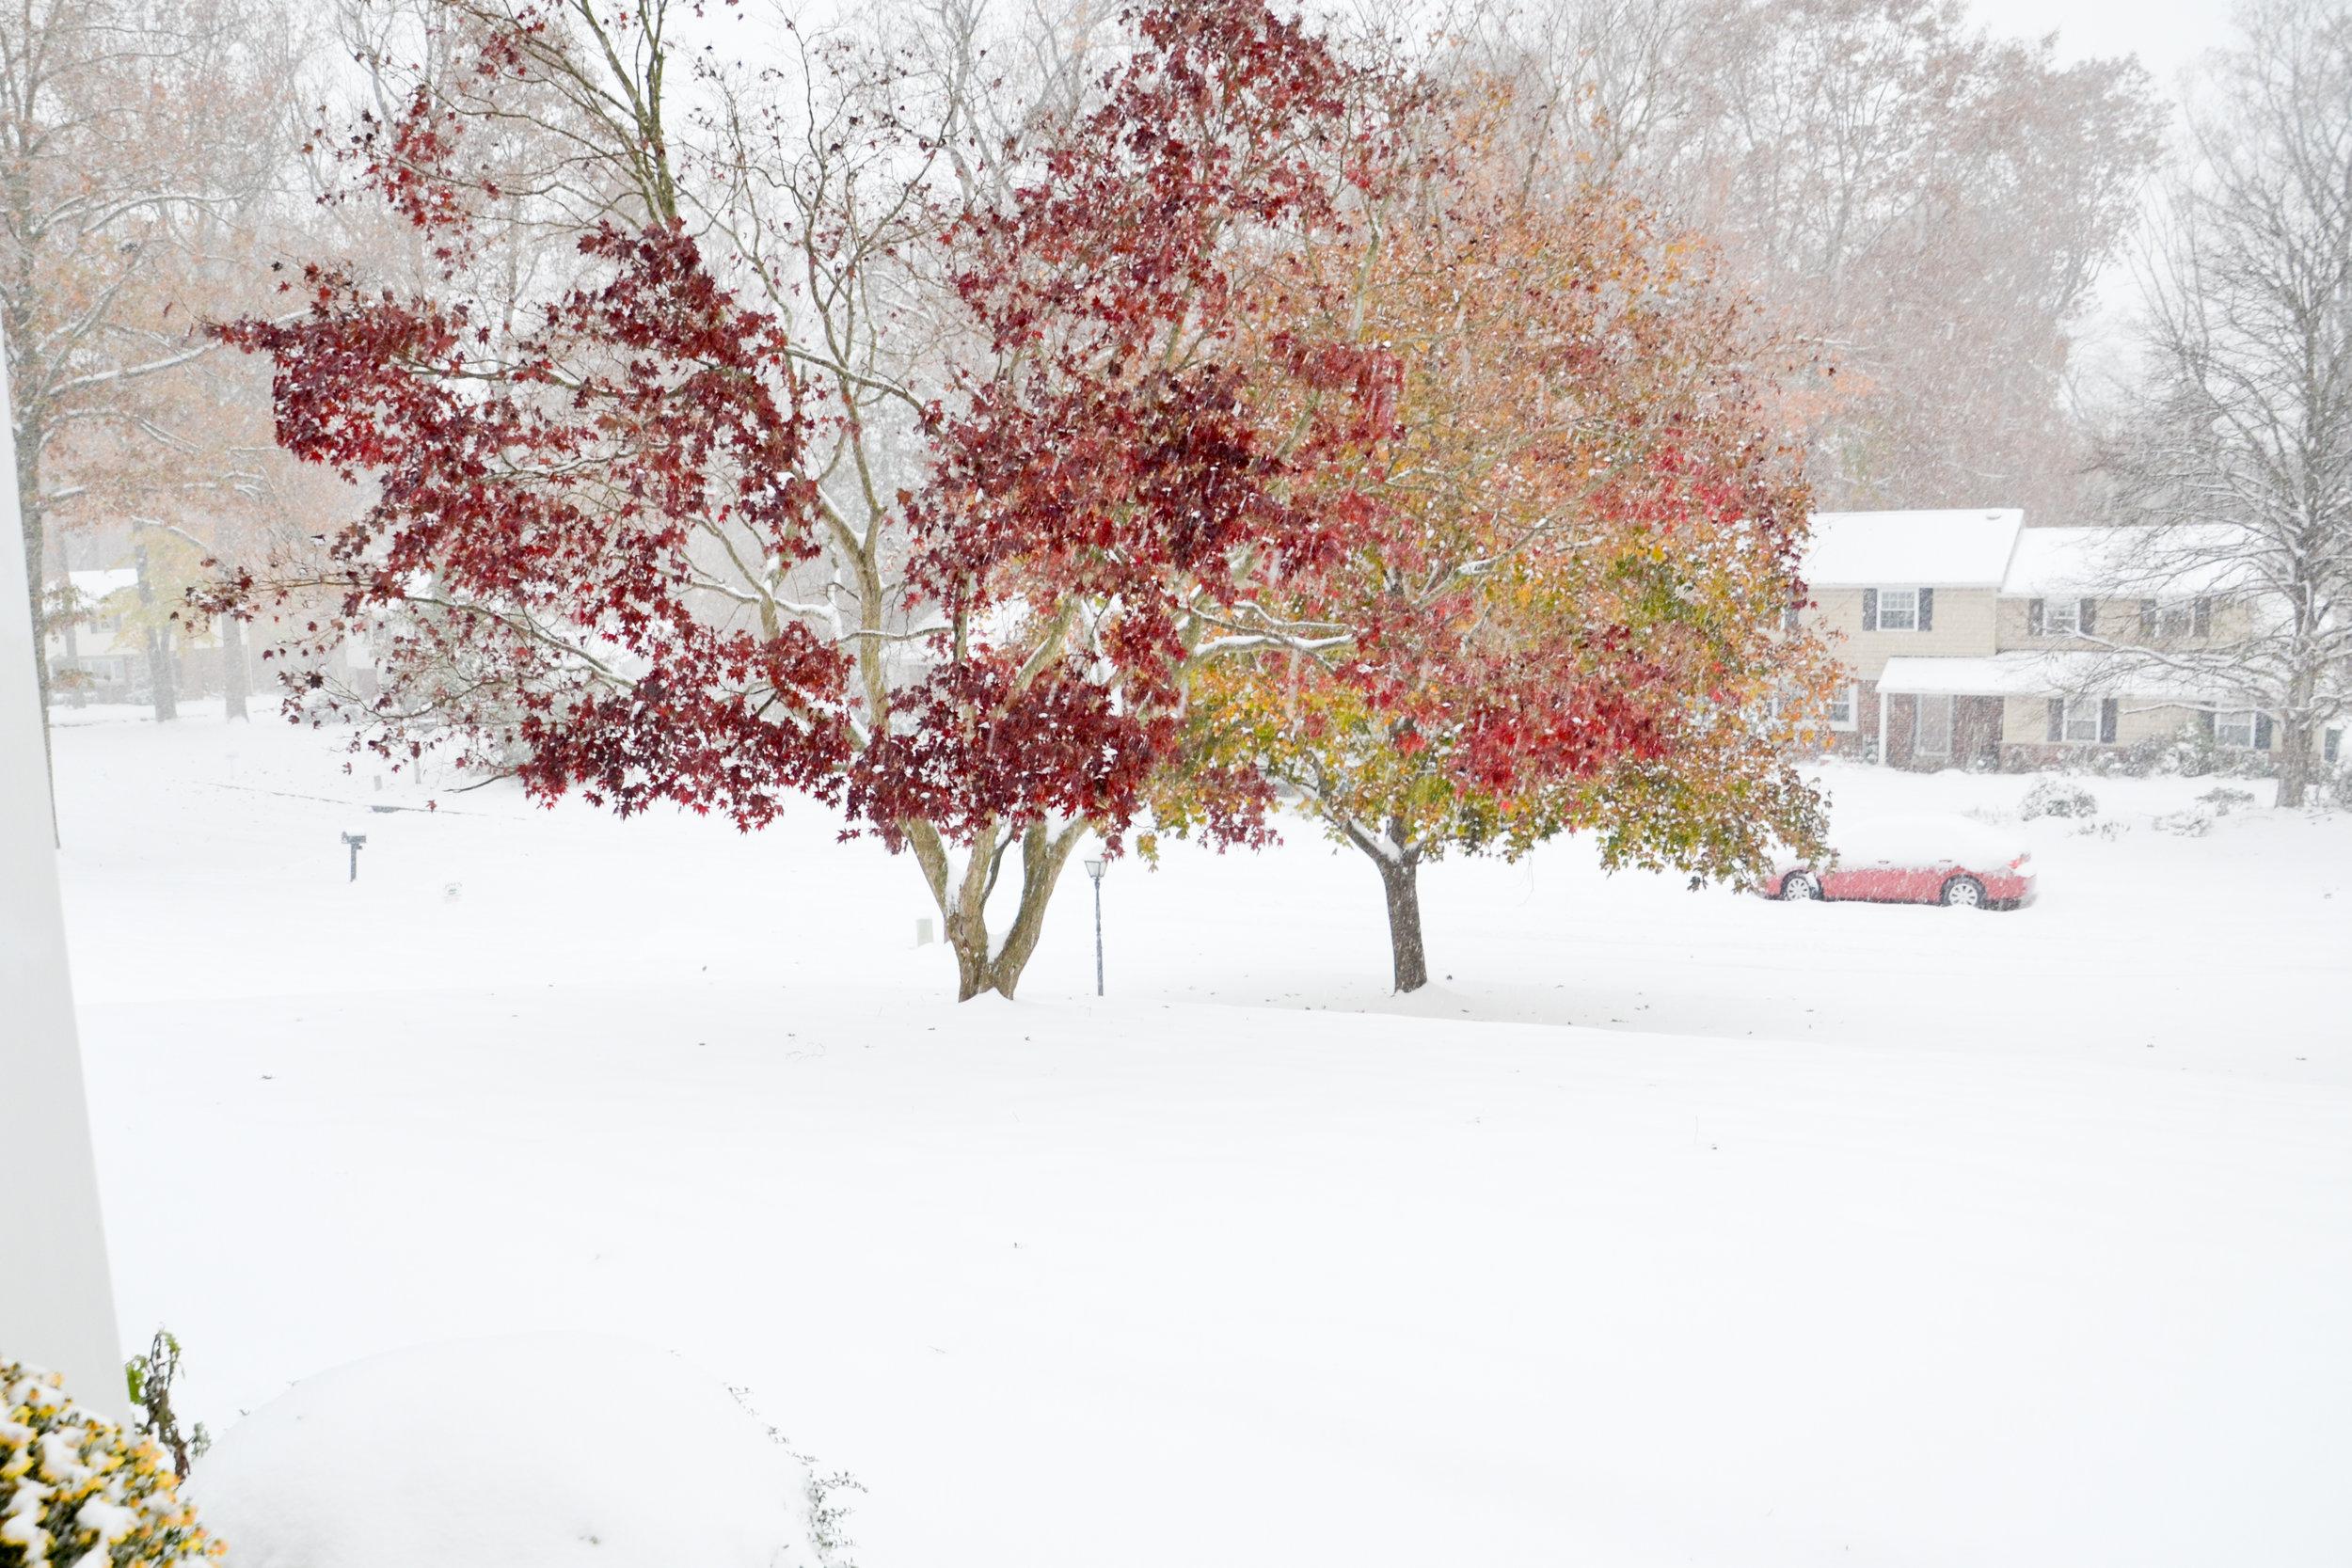 This week's snow!